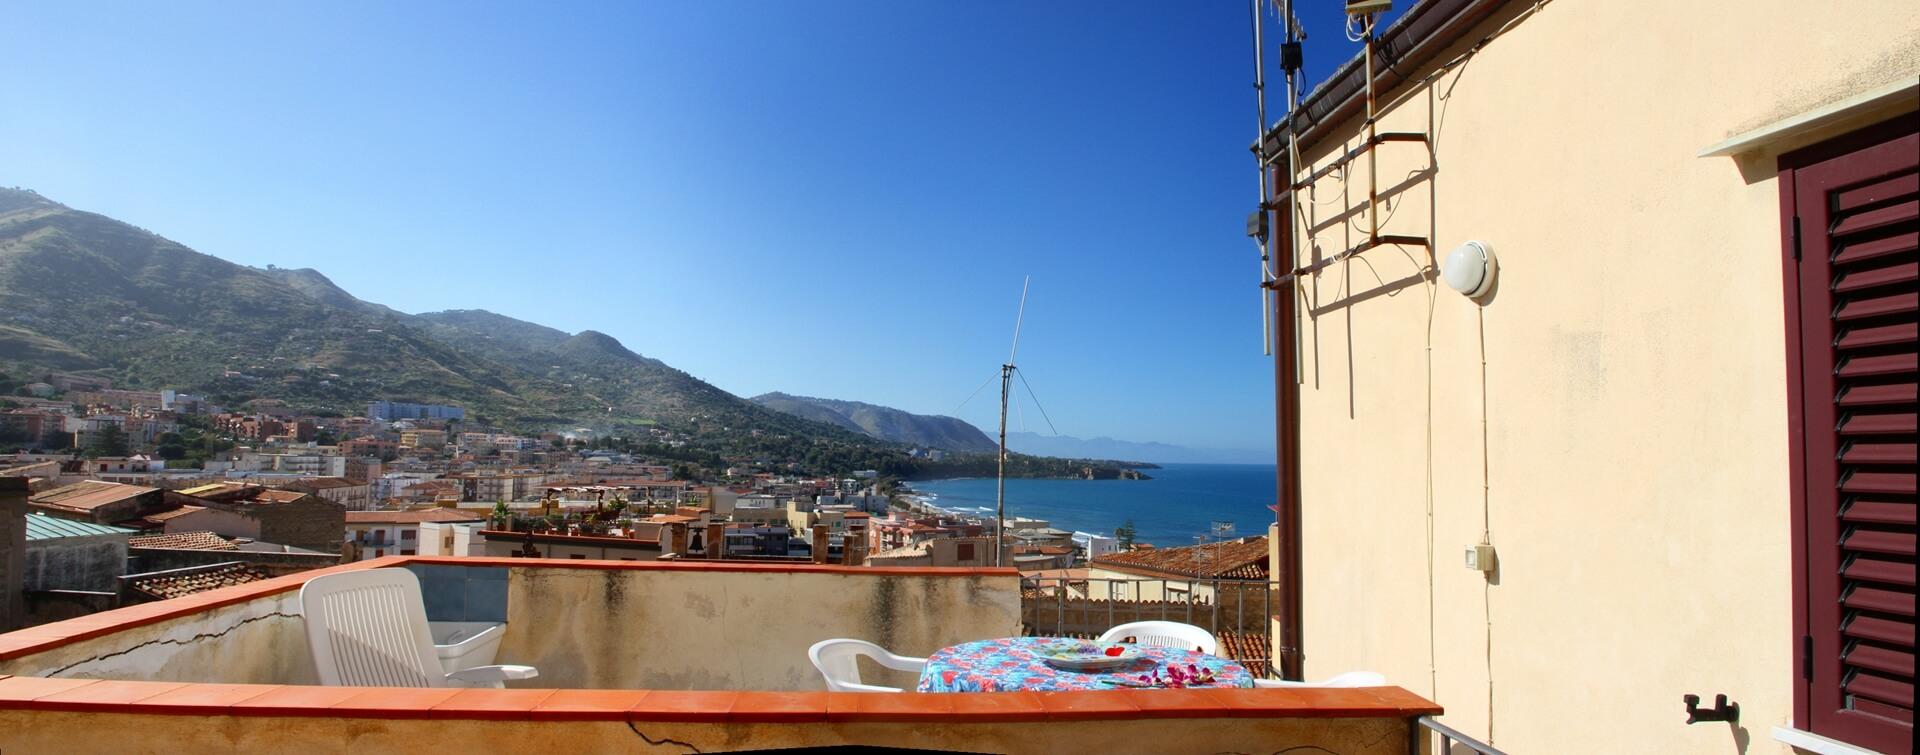 Casa Saraceni - BookingCefalù.com